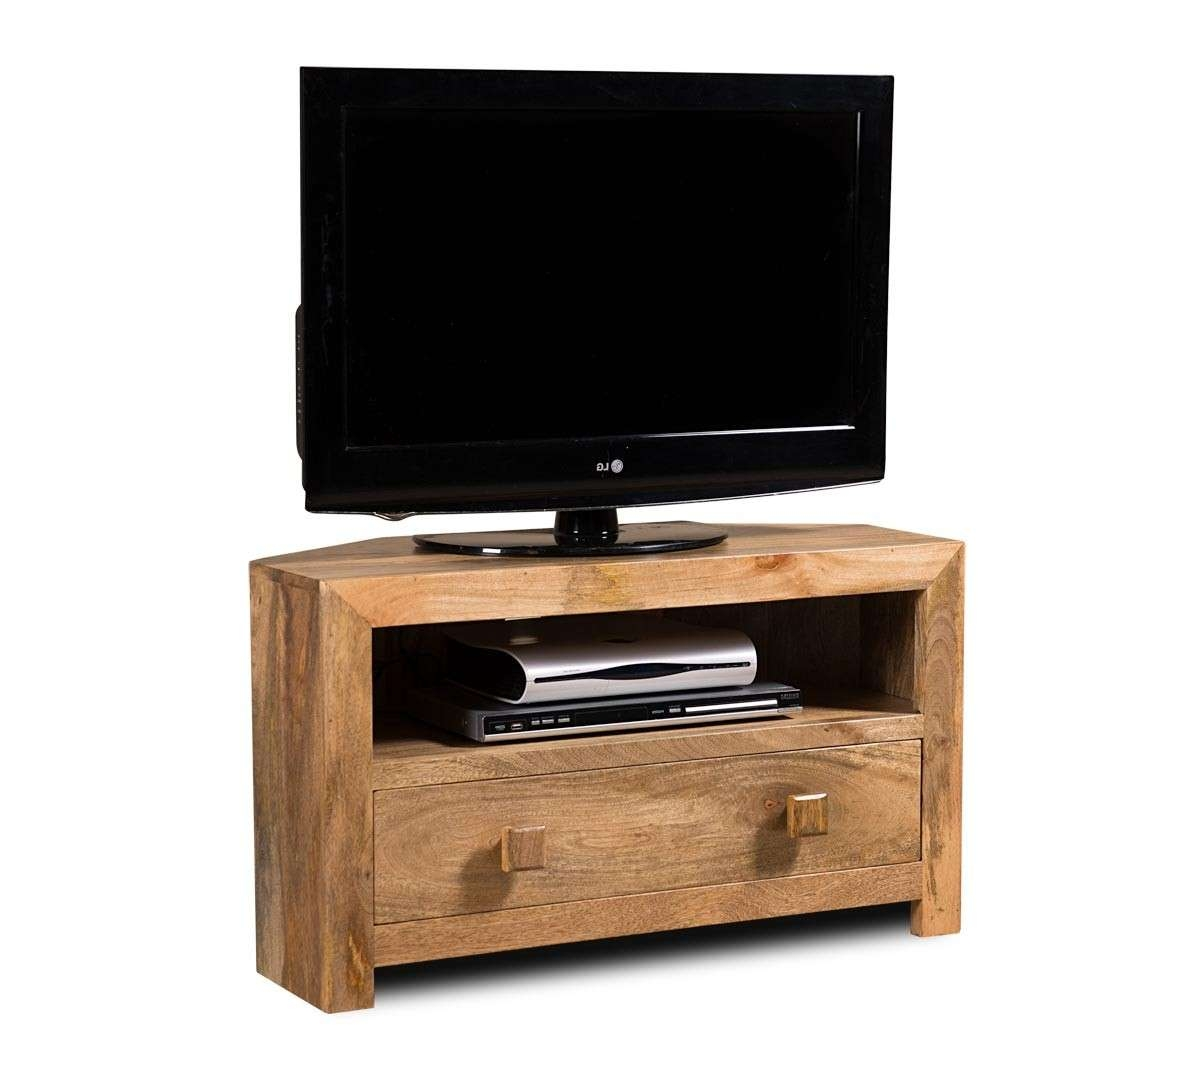 Dakota Light Mango Small Corner Tv Stand | Casa Bella Furniture Uk In Wood Corner Tv Cabinets (View 8 of 20)